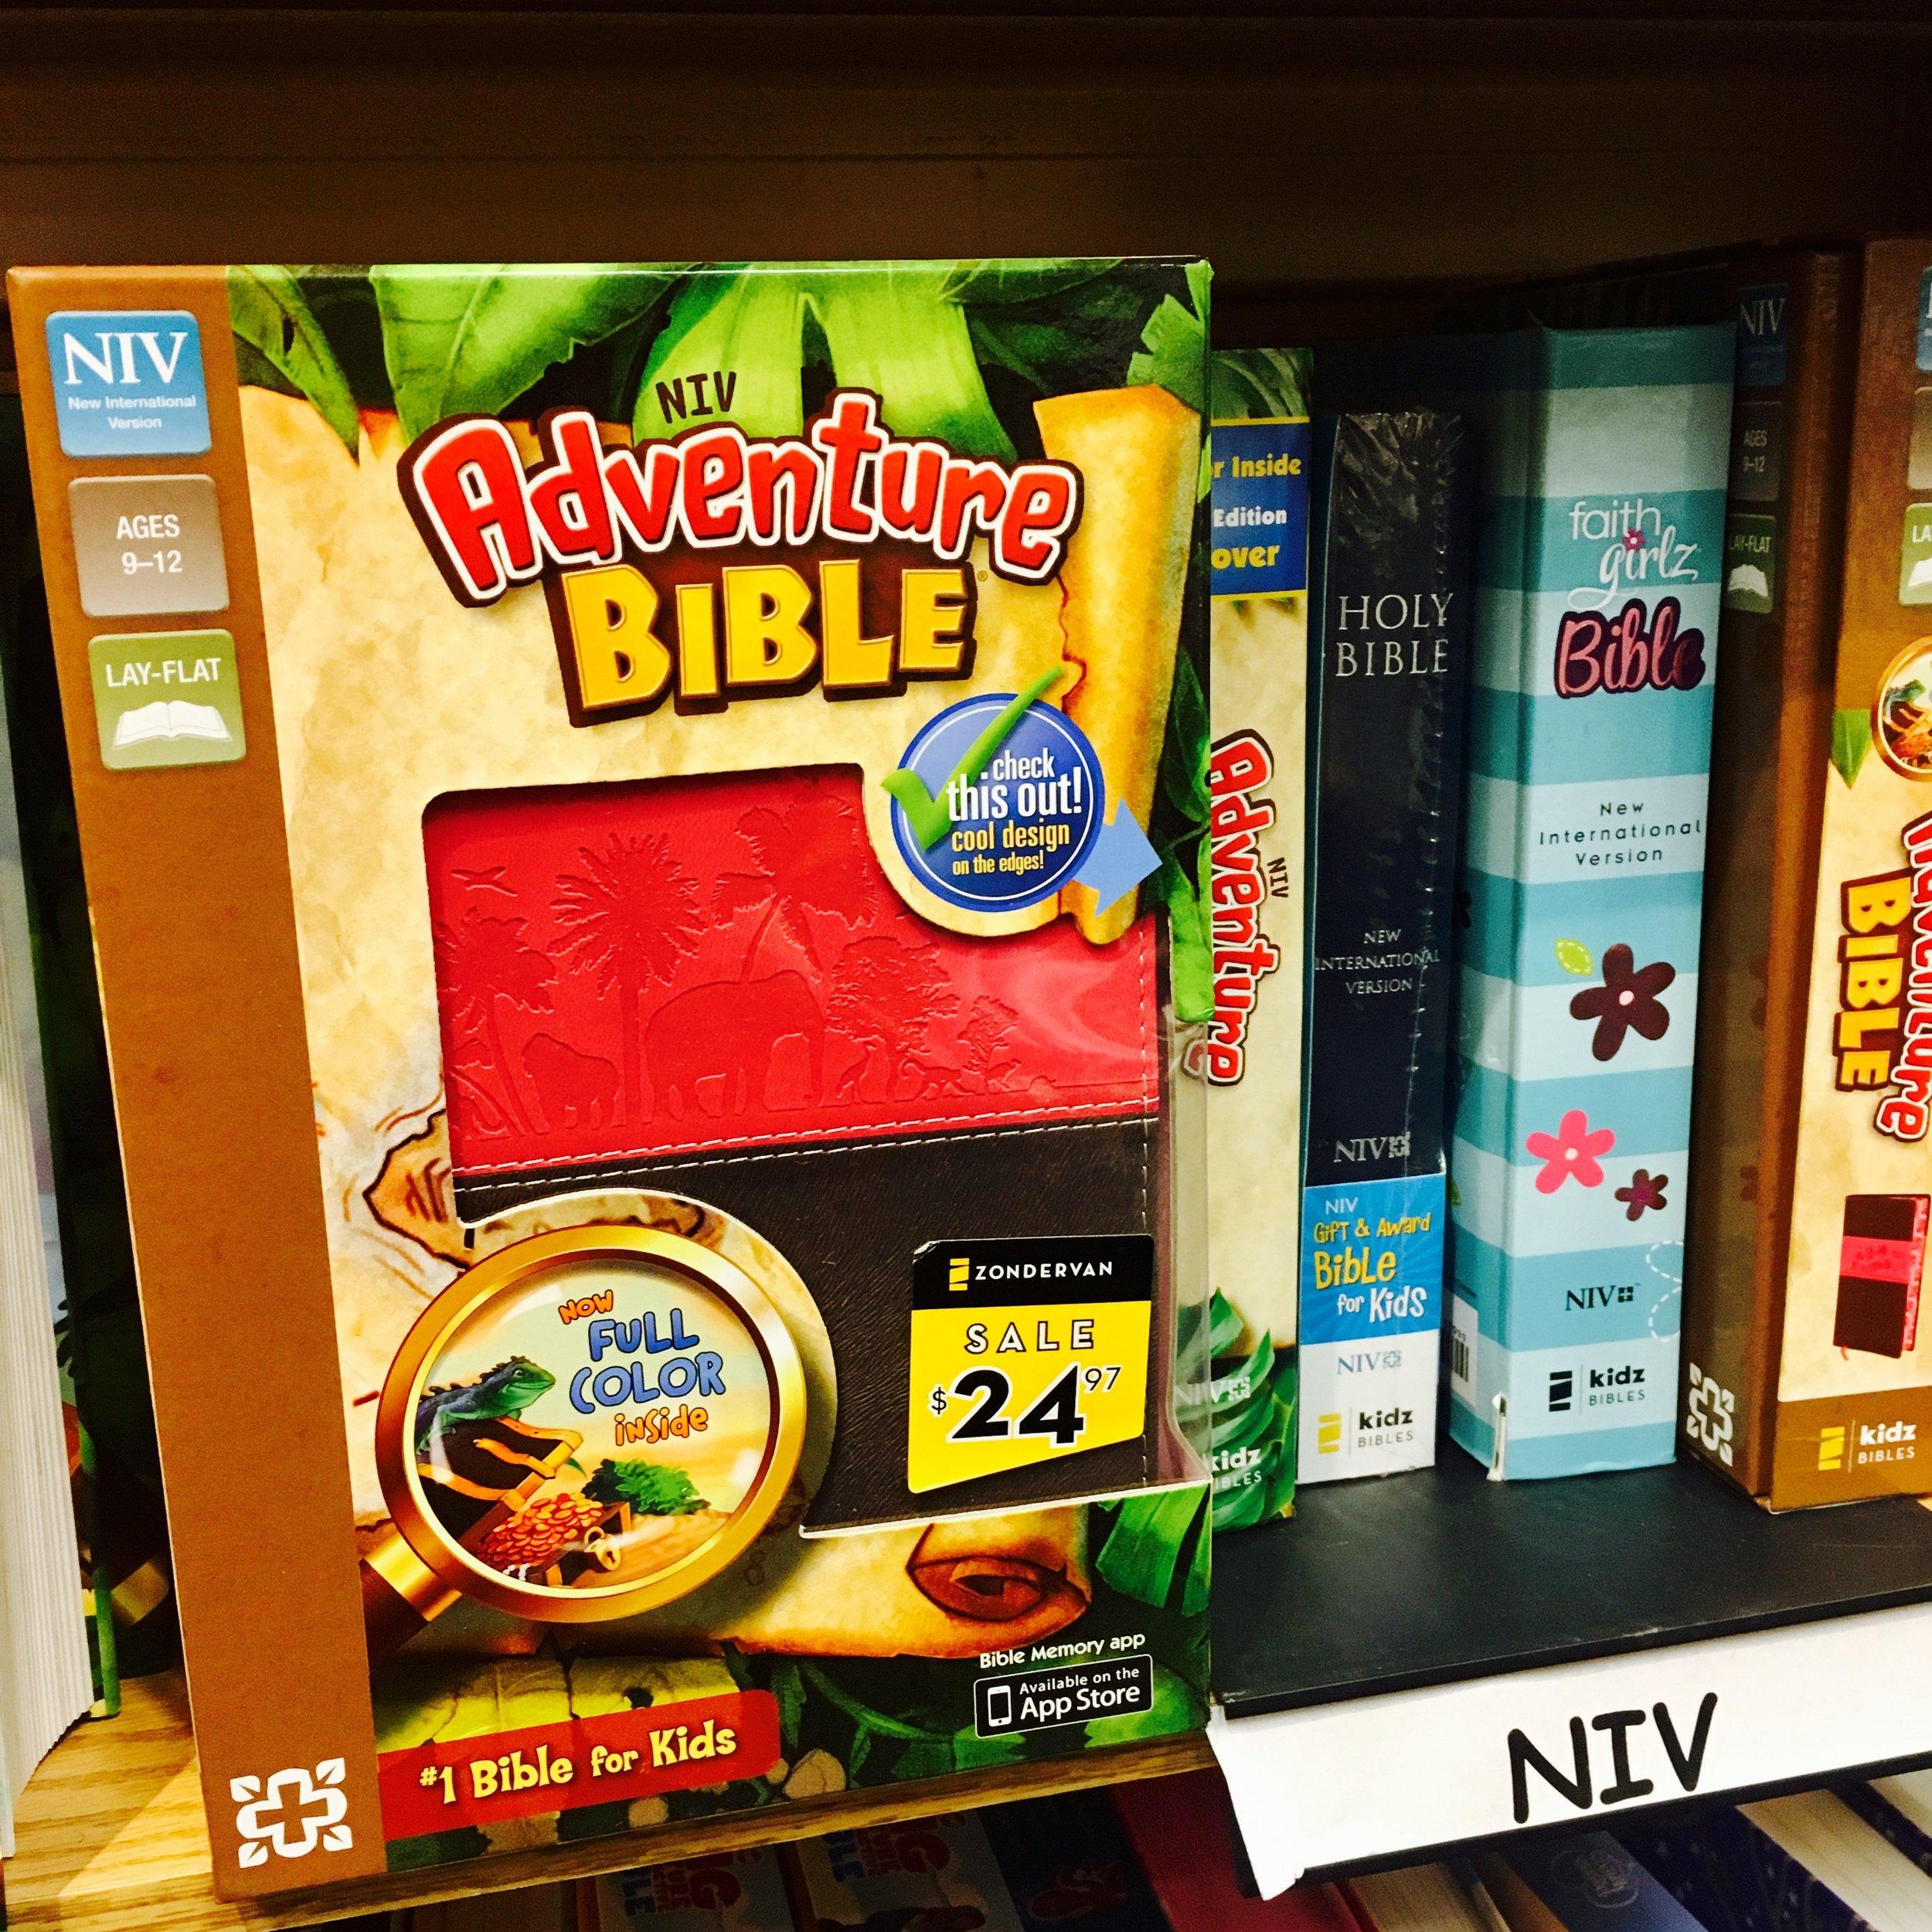 Children's Bibles